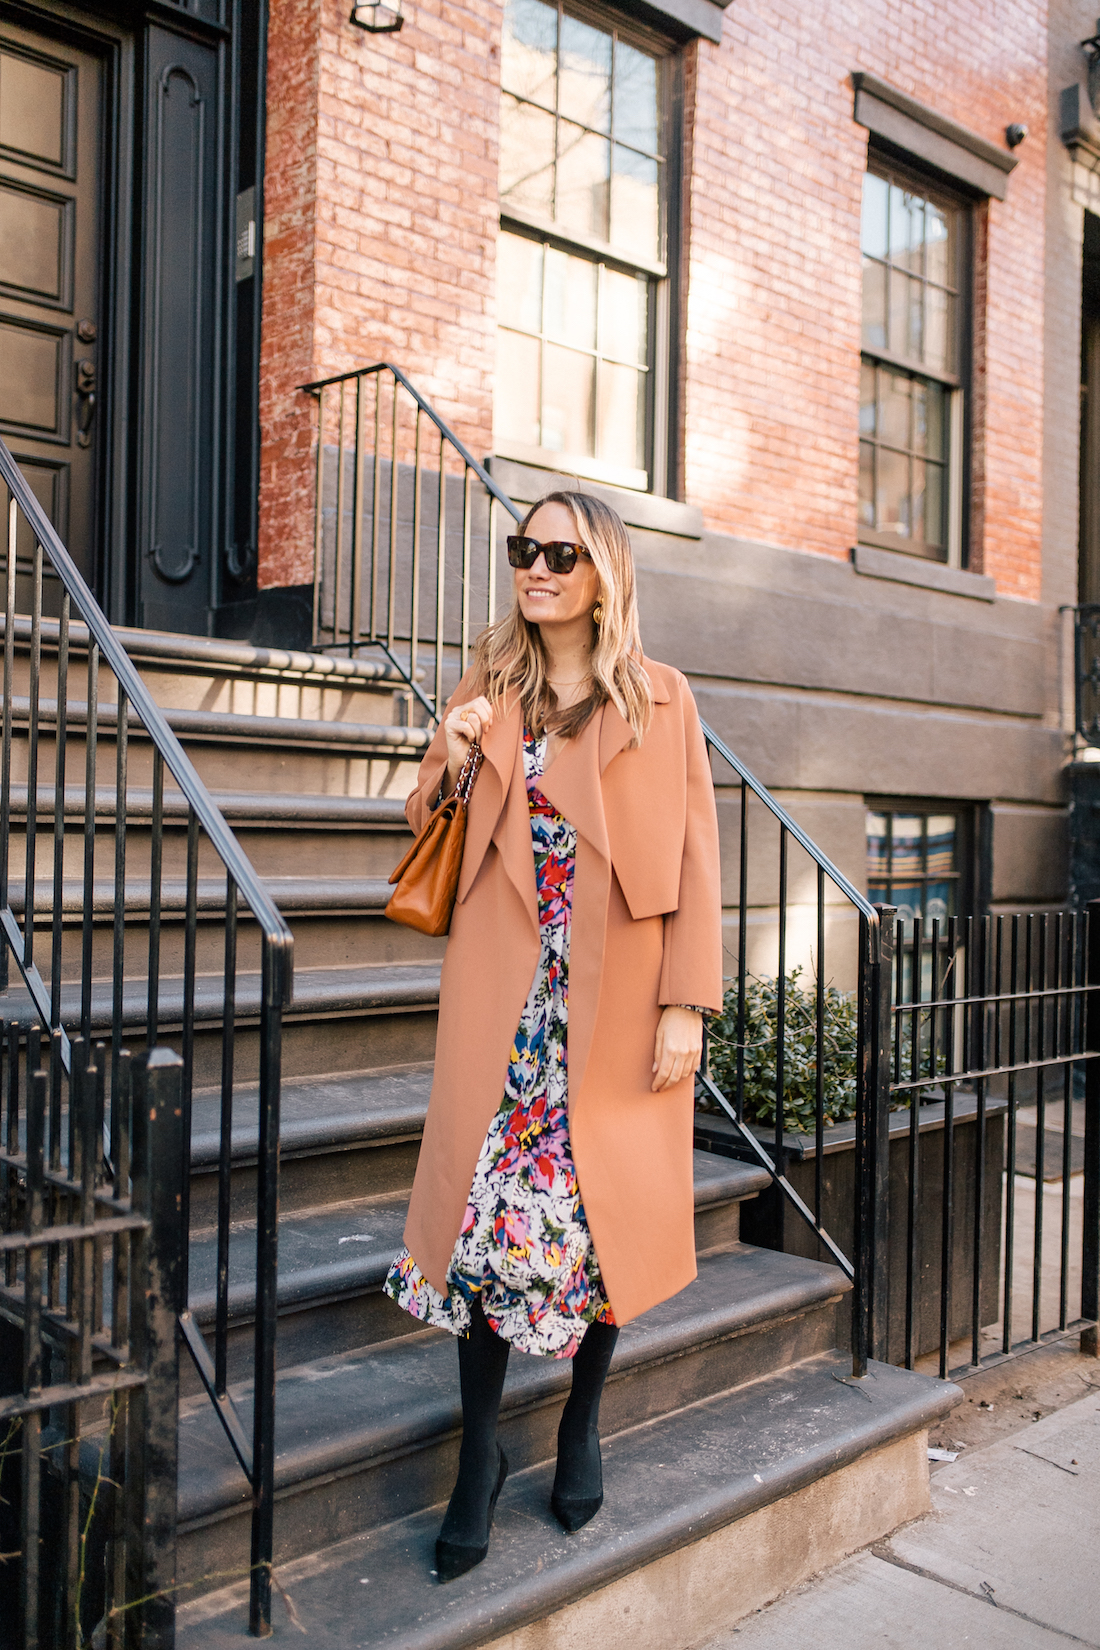 The Stripe's Outfit Details: Malene Birger Coat // Rixo Floral Dress // Express Tights // Manolo Blahnik Heels // Chanel Purse // Celine Sunglasses // Tuckernuck Birdcage Earrings